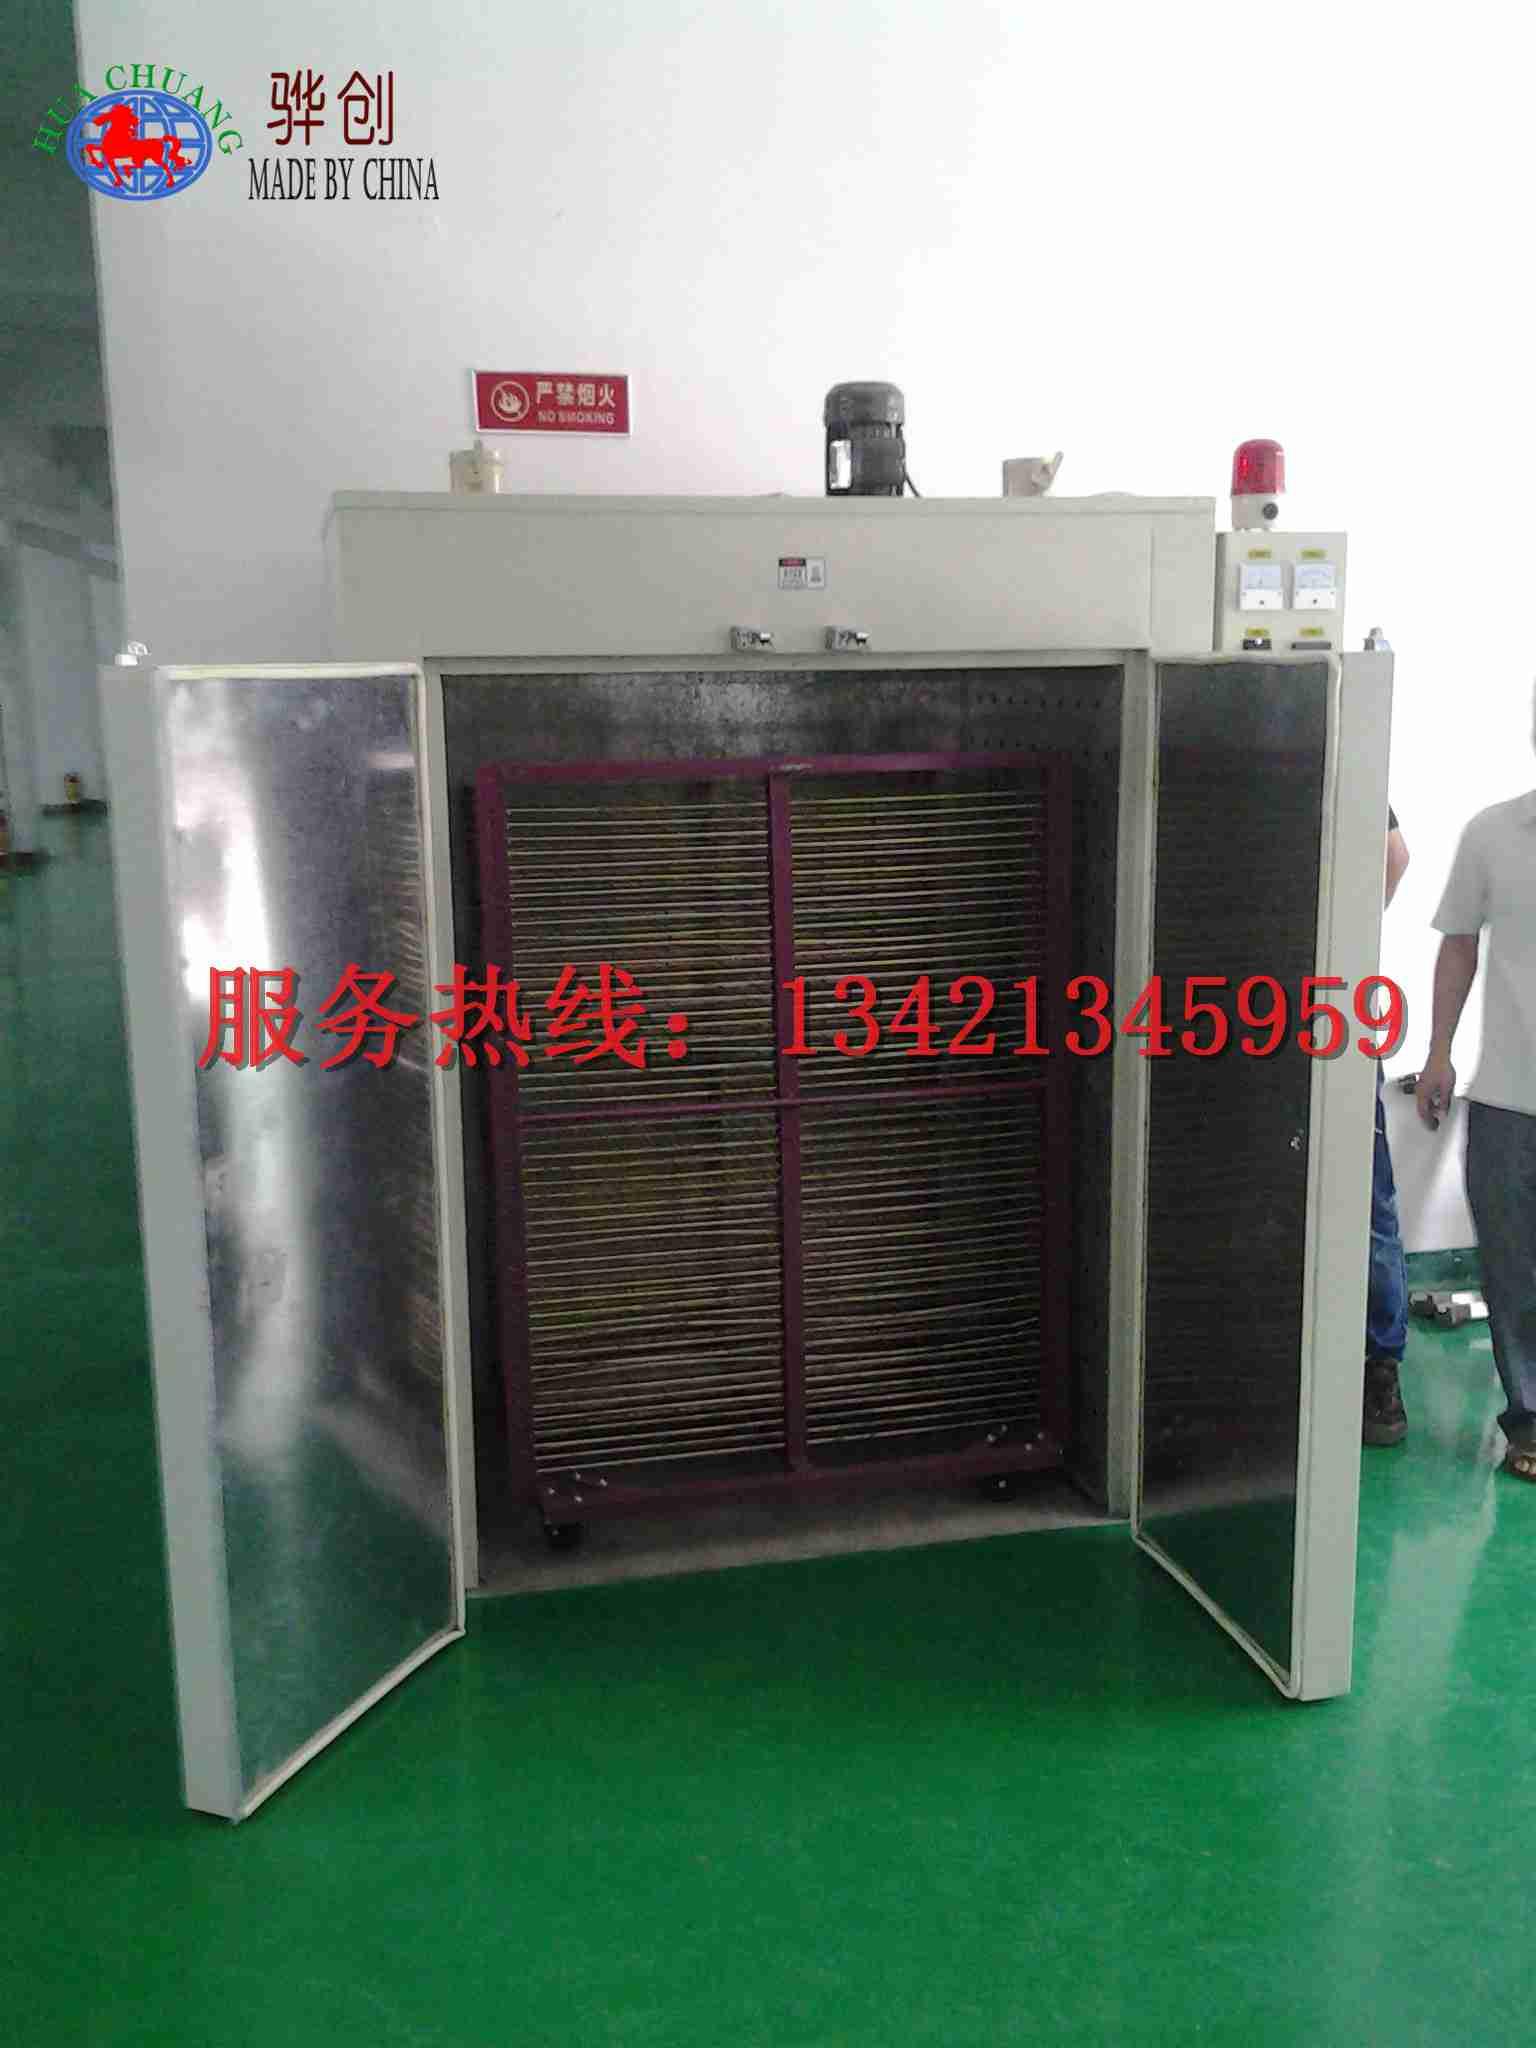 FPC软板烤箱,fpc软性电路板烘箱 柔性薄膜电路板烤箱的设计原理: 1. FPC柔性线路板烤箱型号: HHY-KX900R 2. FPC线路板烤箱内胆尺寸(mm):W950×H1300×D600 3. FPC电路板烤箱温度范围:RT+10~300 4. 温度均匀性: ±1.5% 5. 波 动 度:±0.5 6. 电 源:380V 50Hz 9.